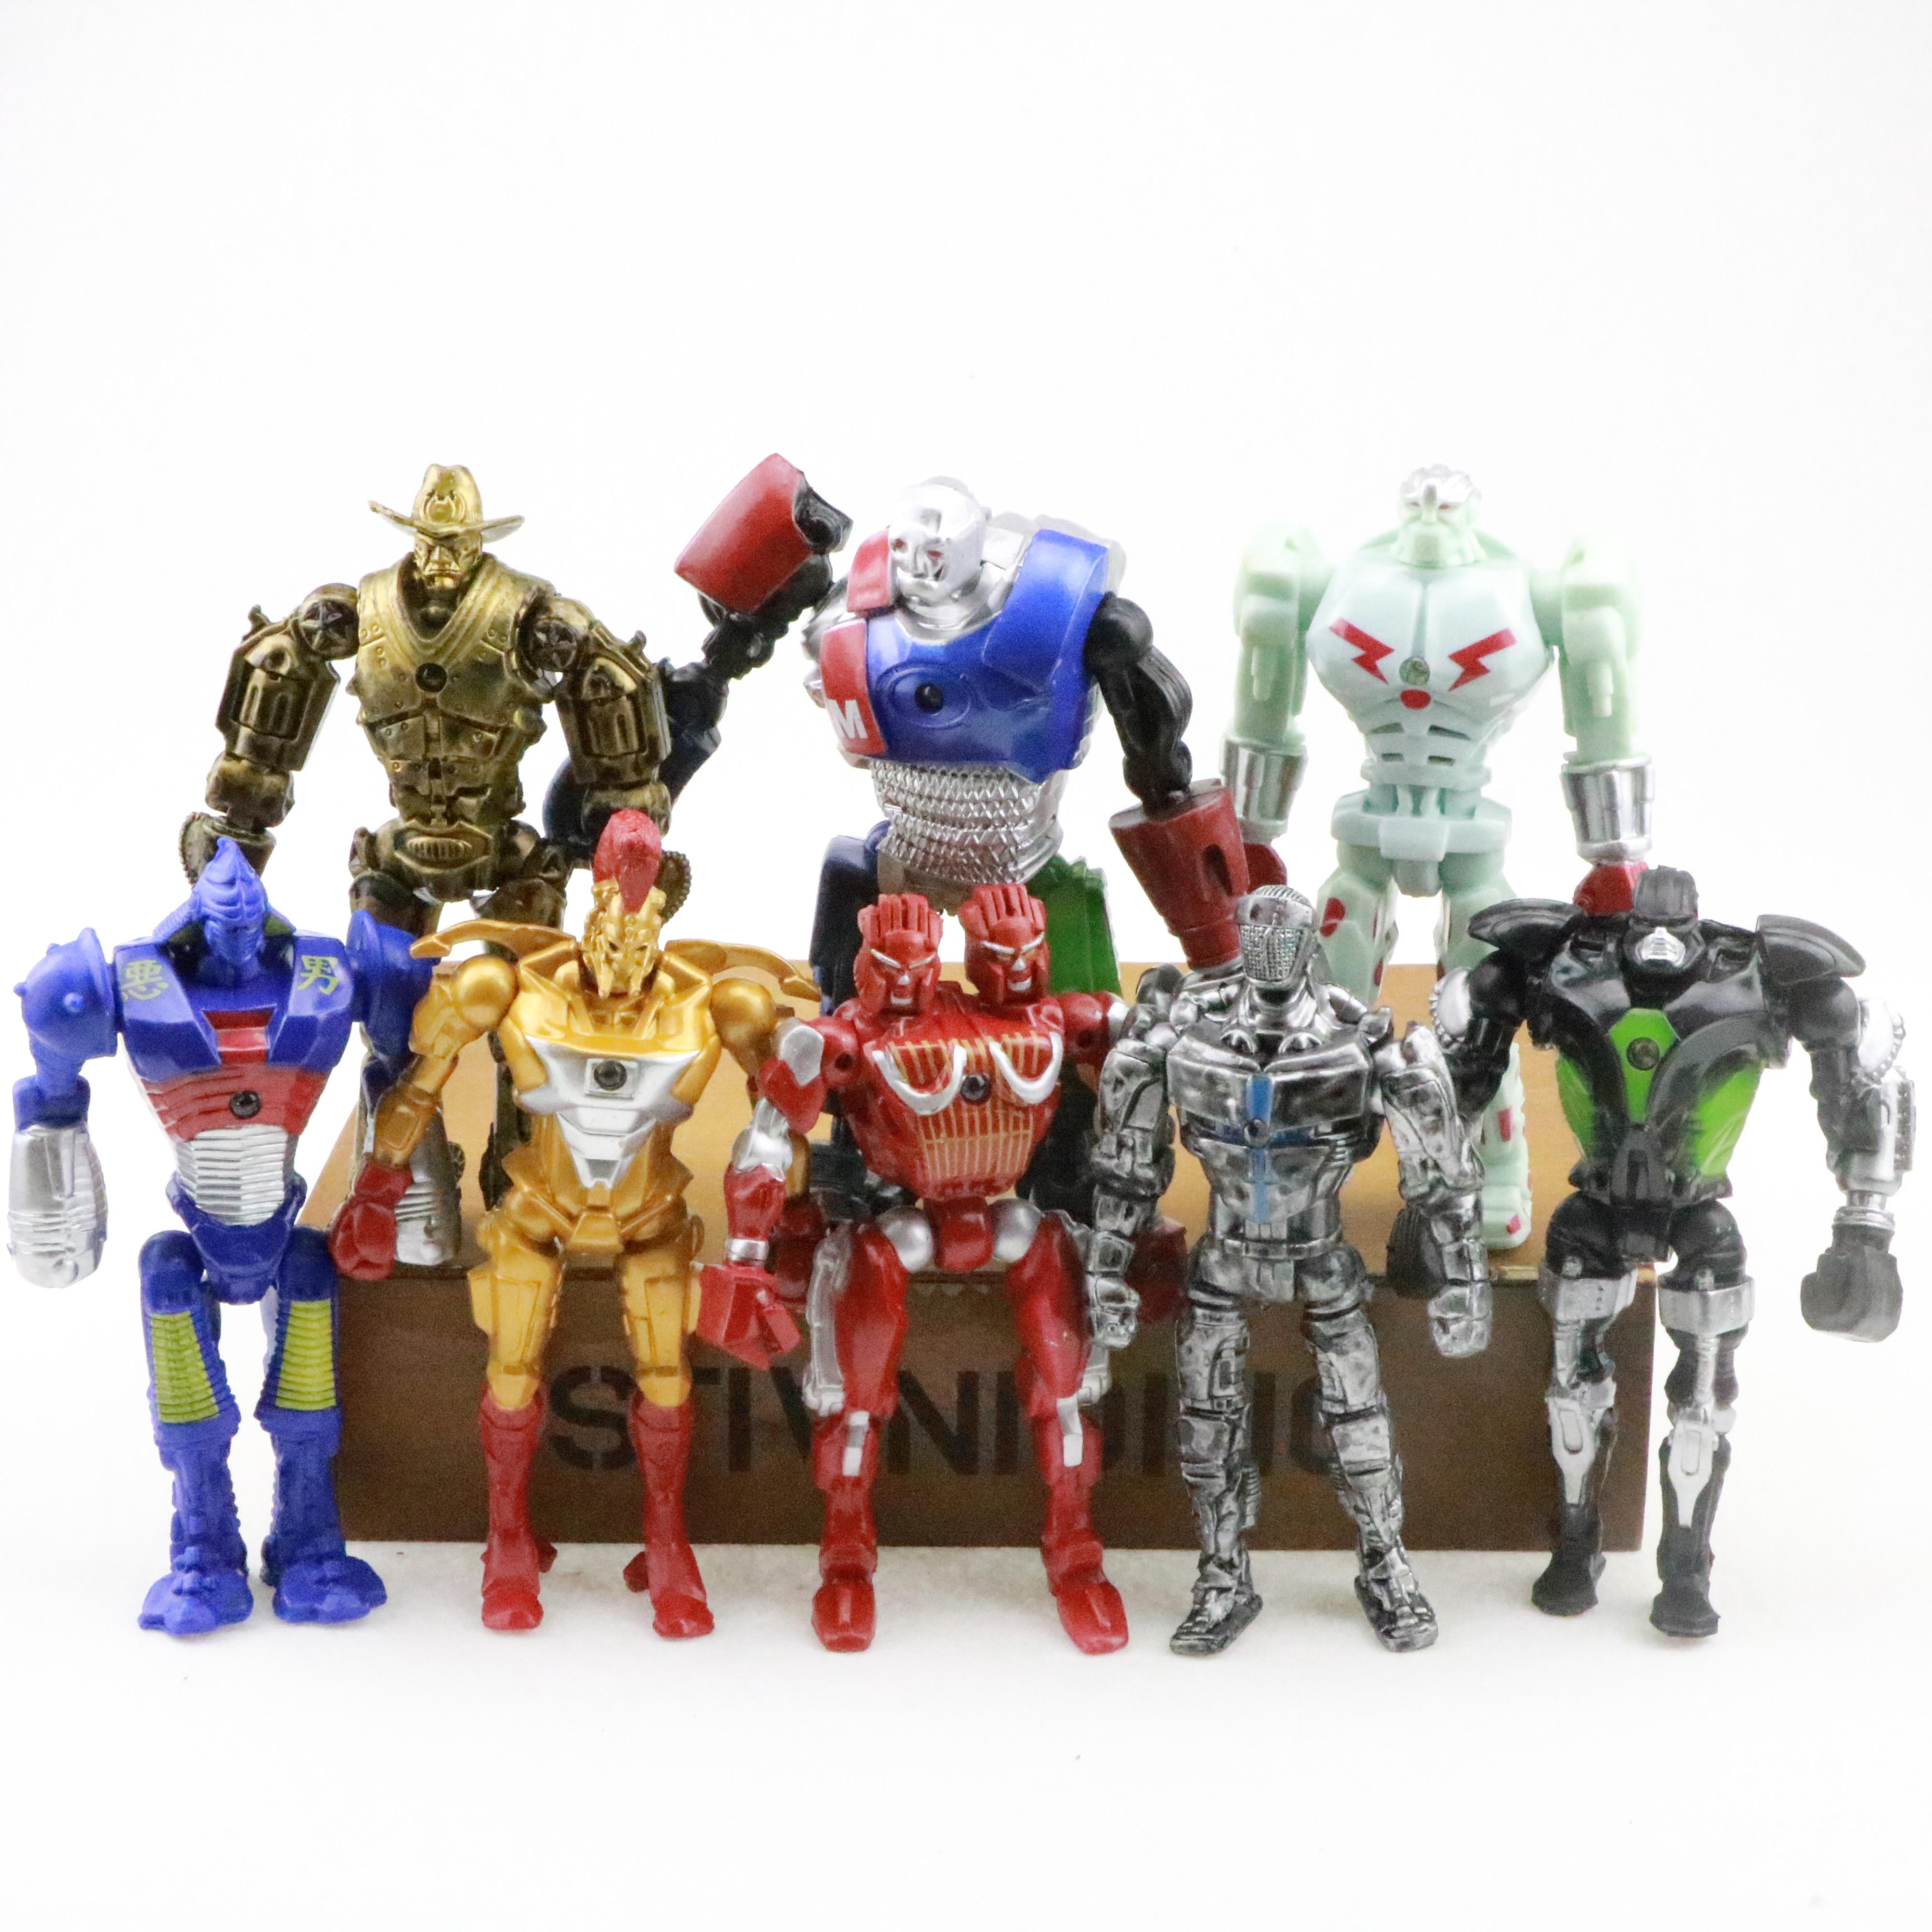 8pcs//Set Film Real Steel Zeus Atom Midas Noisey Garçons Figurines Robot Toys